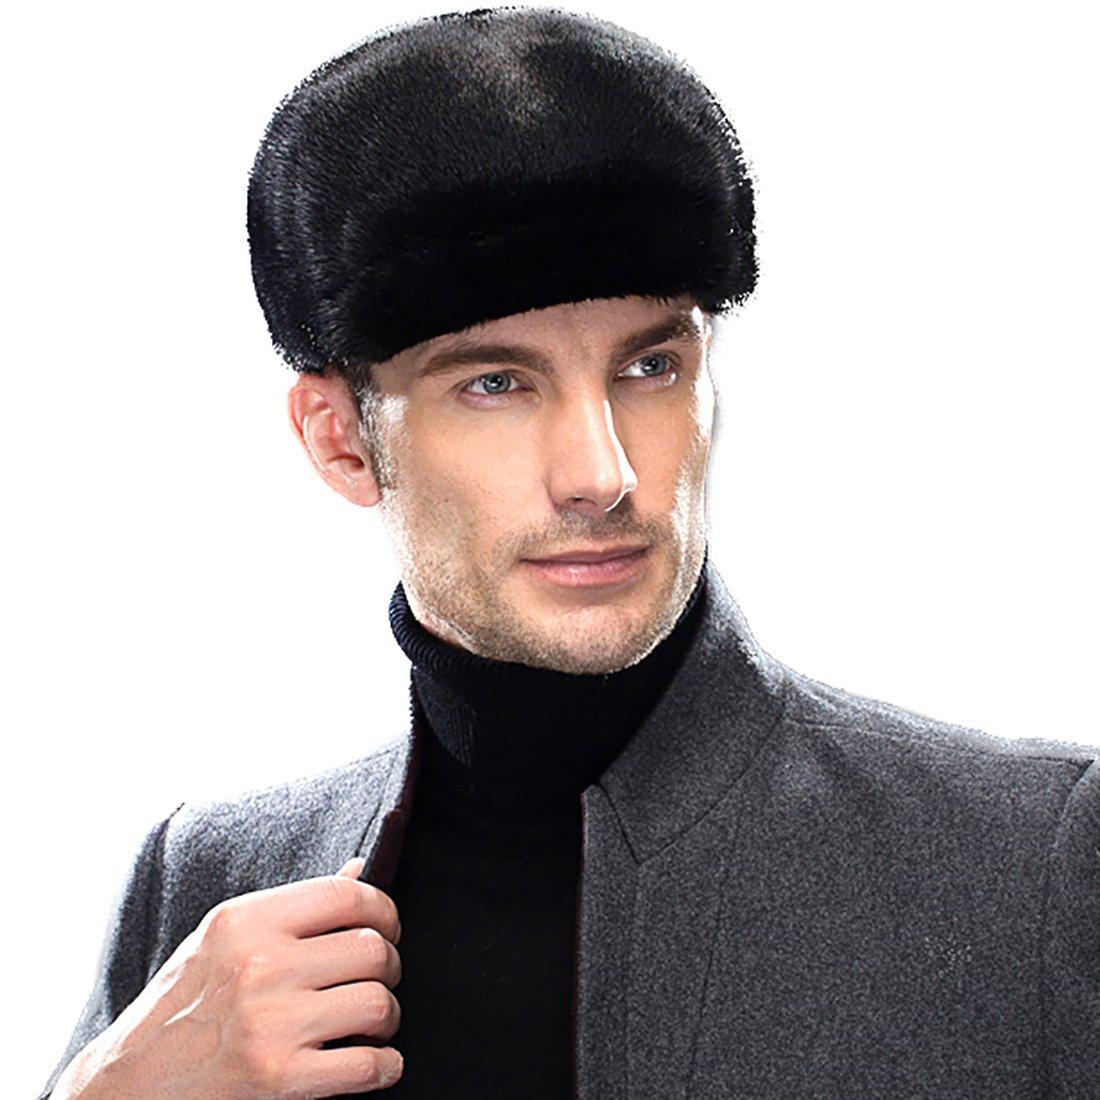 URSFUR Men's Mink Fur Peaked Cap Winter Visor Hat